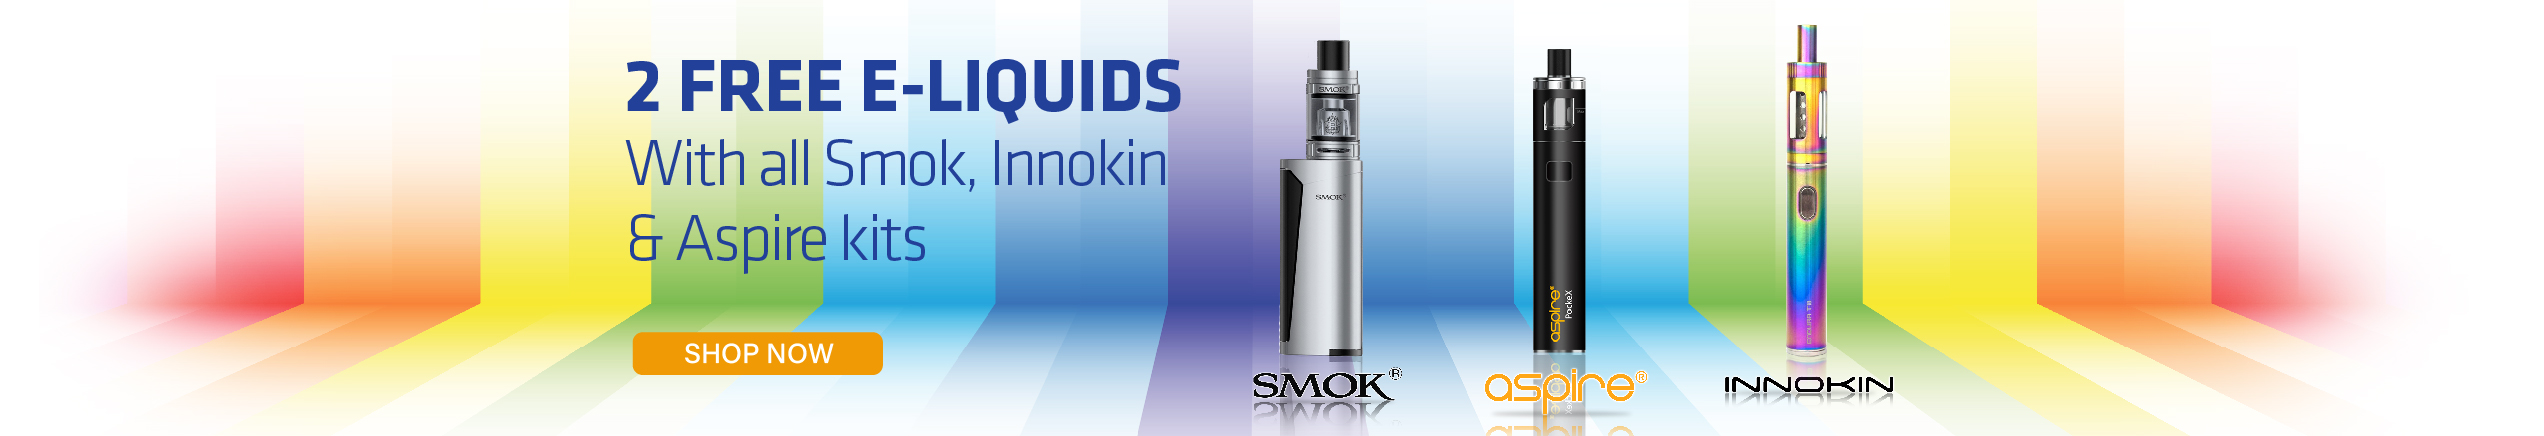 2 free e-liquids slider